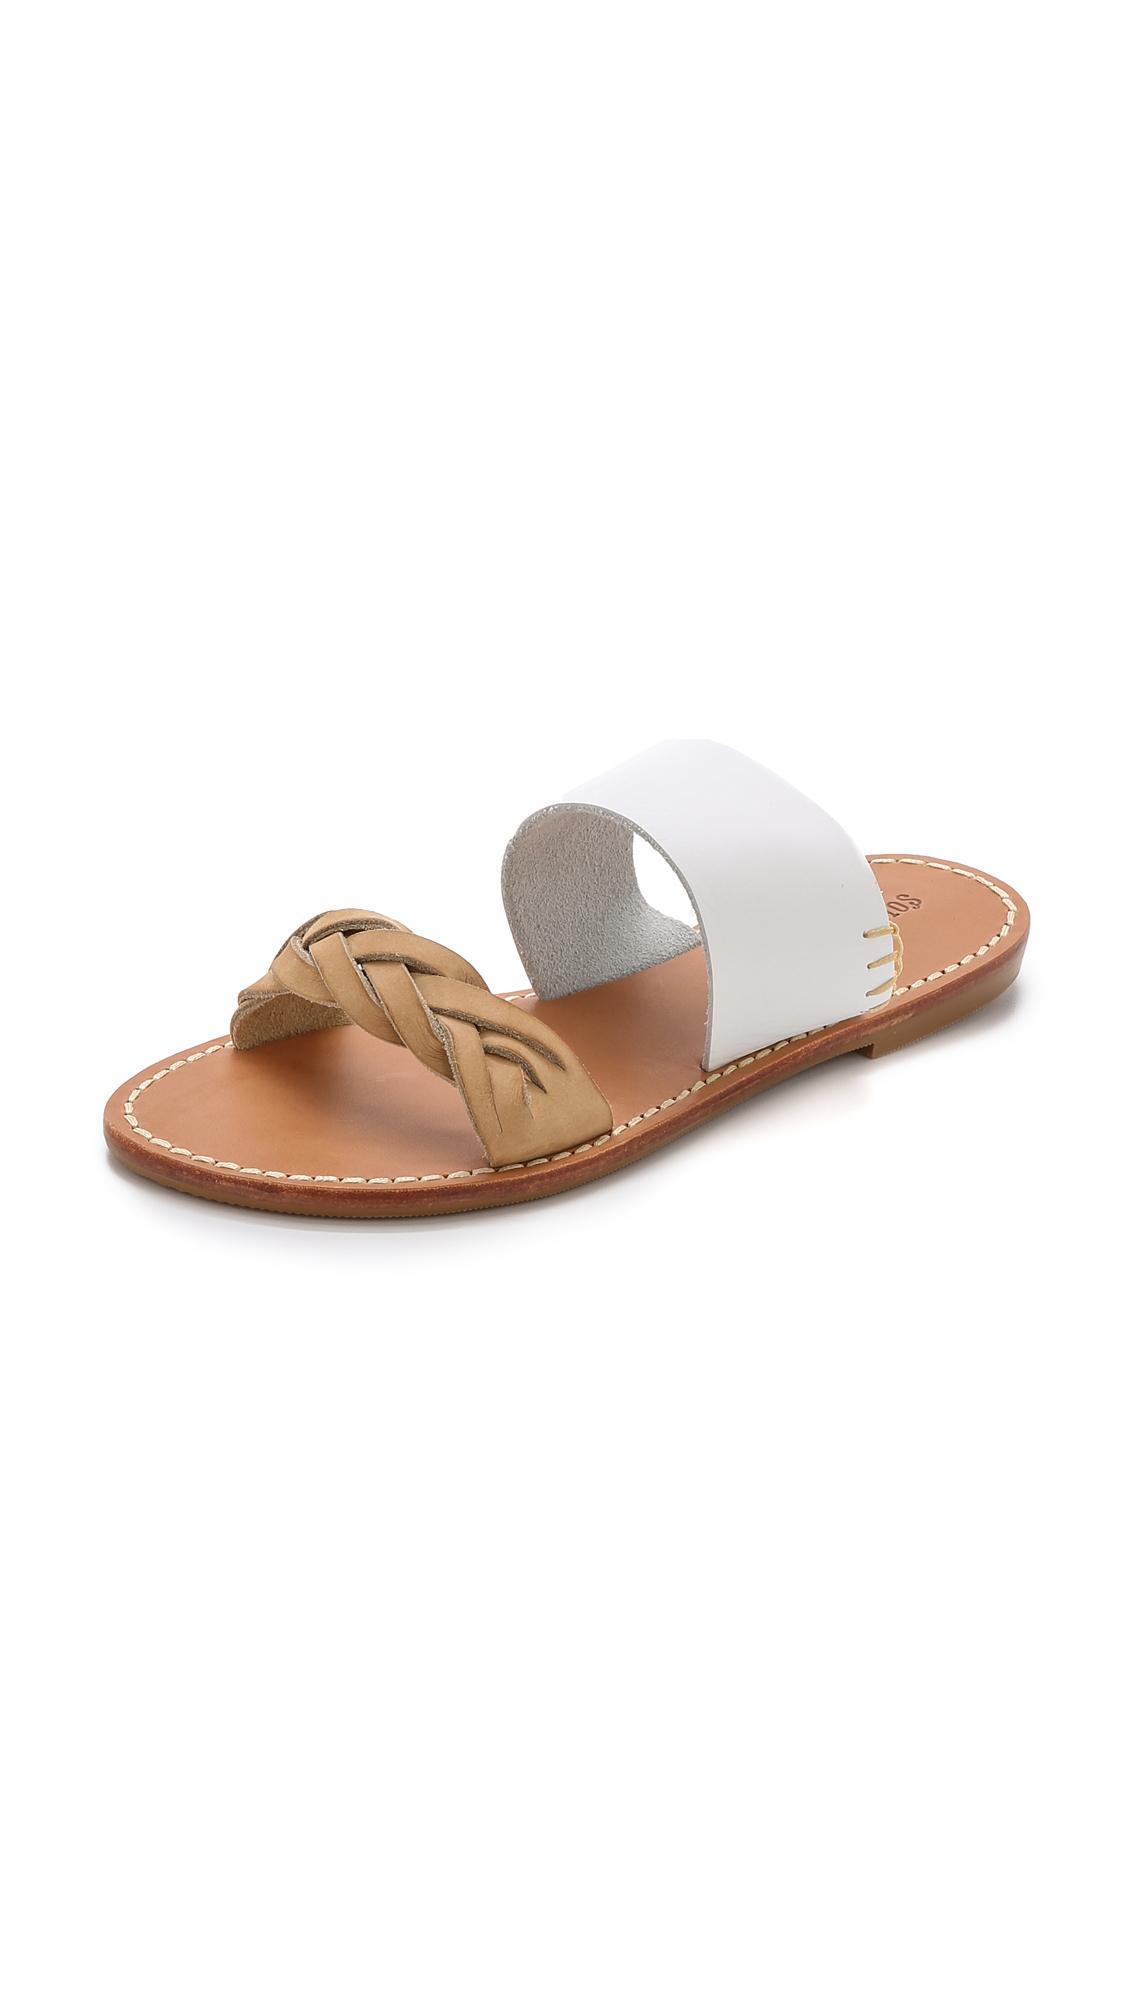 Soludos Braided Slide Sandals in White | Lyst